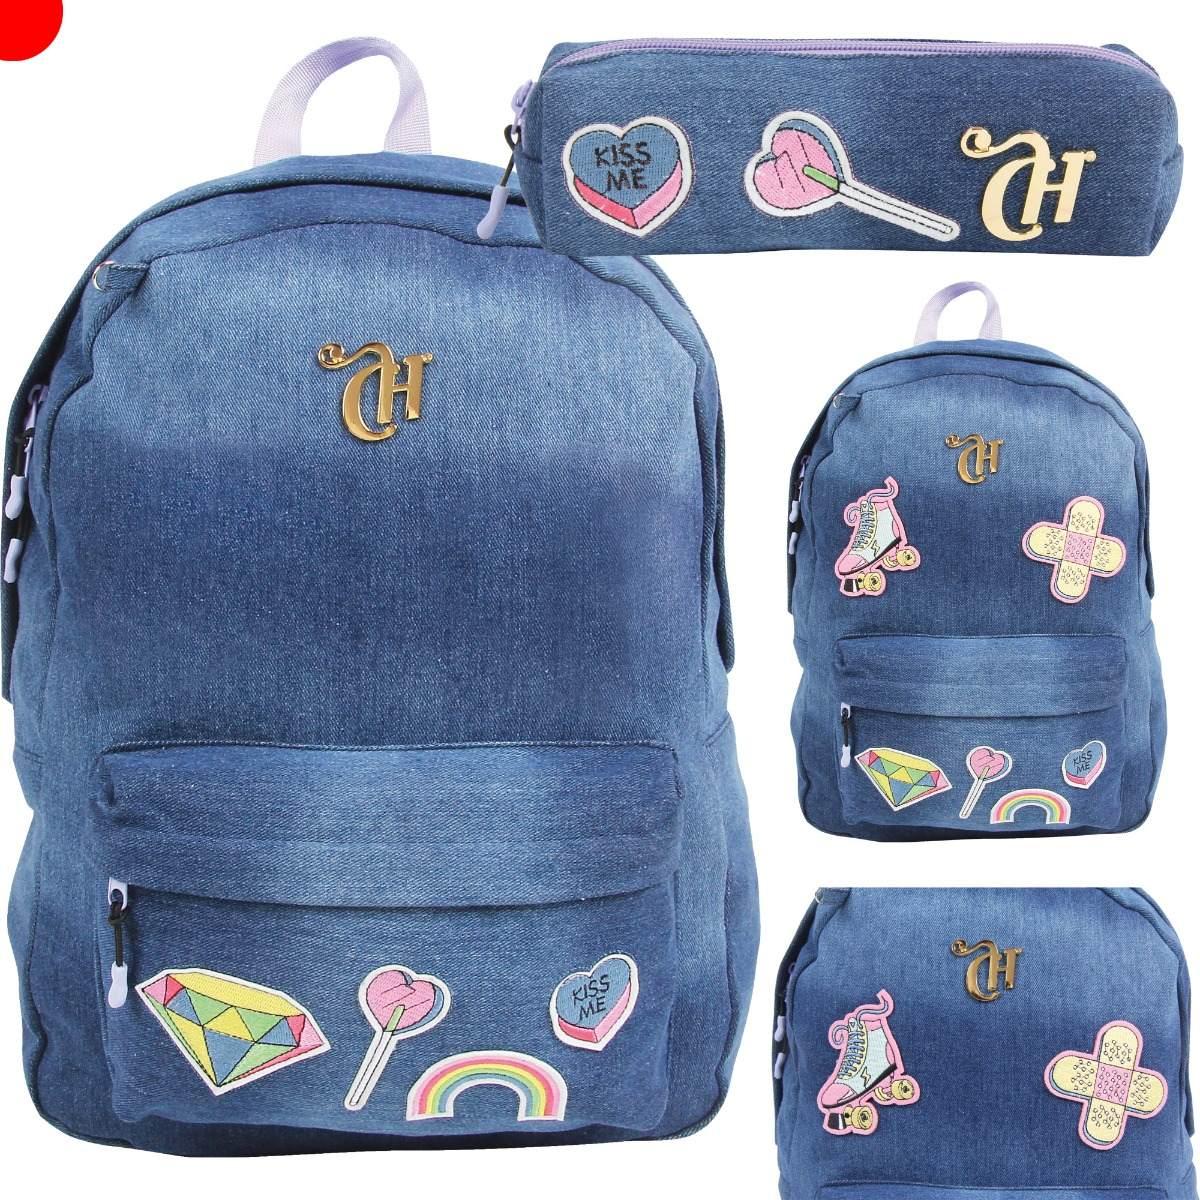 Bolsa Escolar Feminina Tilibra : Kit mochila escolar estojo capricho patches dermiwil